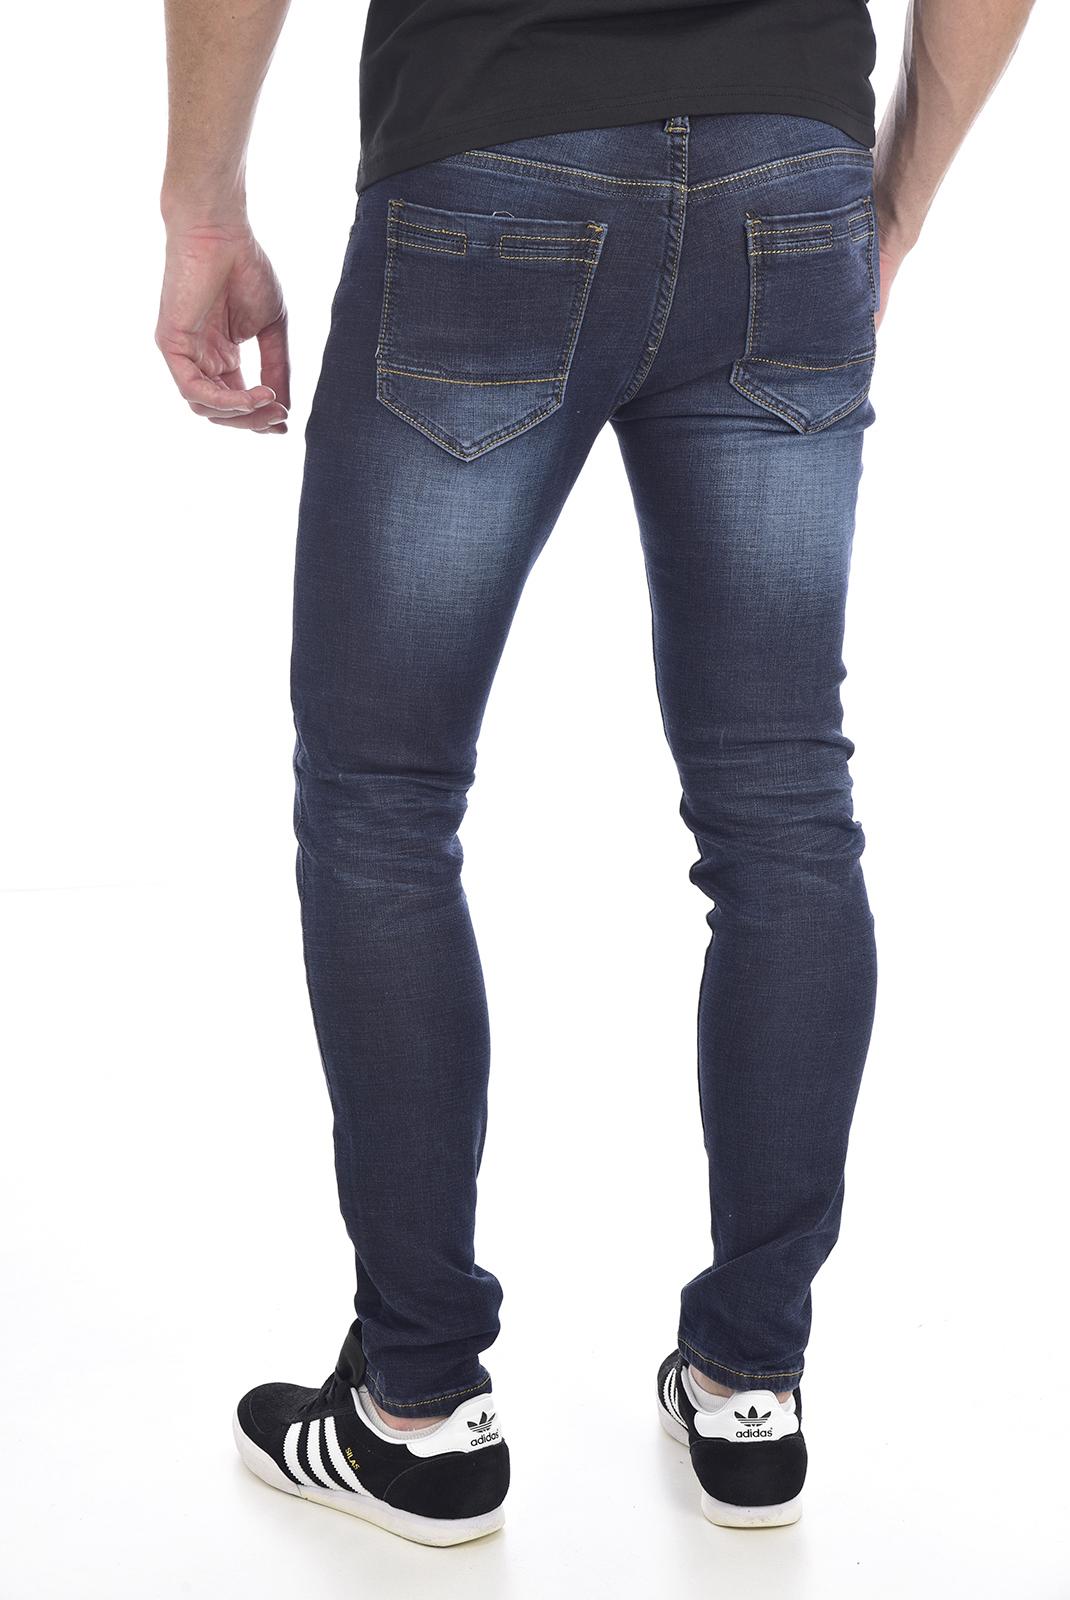 Jeans  Leo gutti 5139 bleu